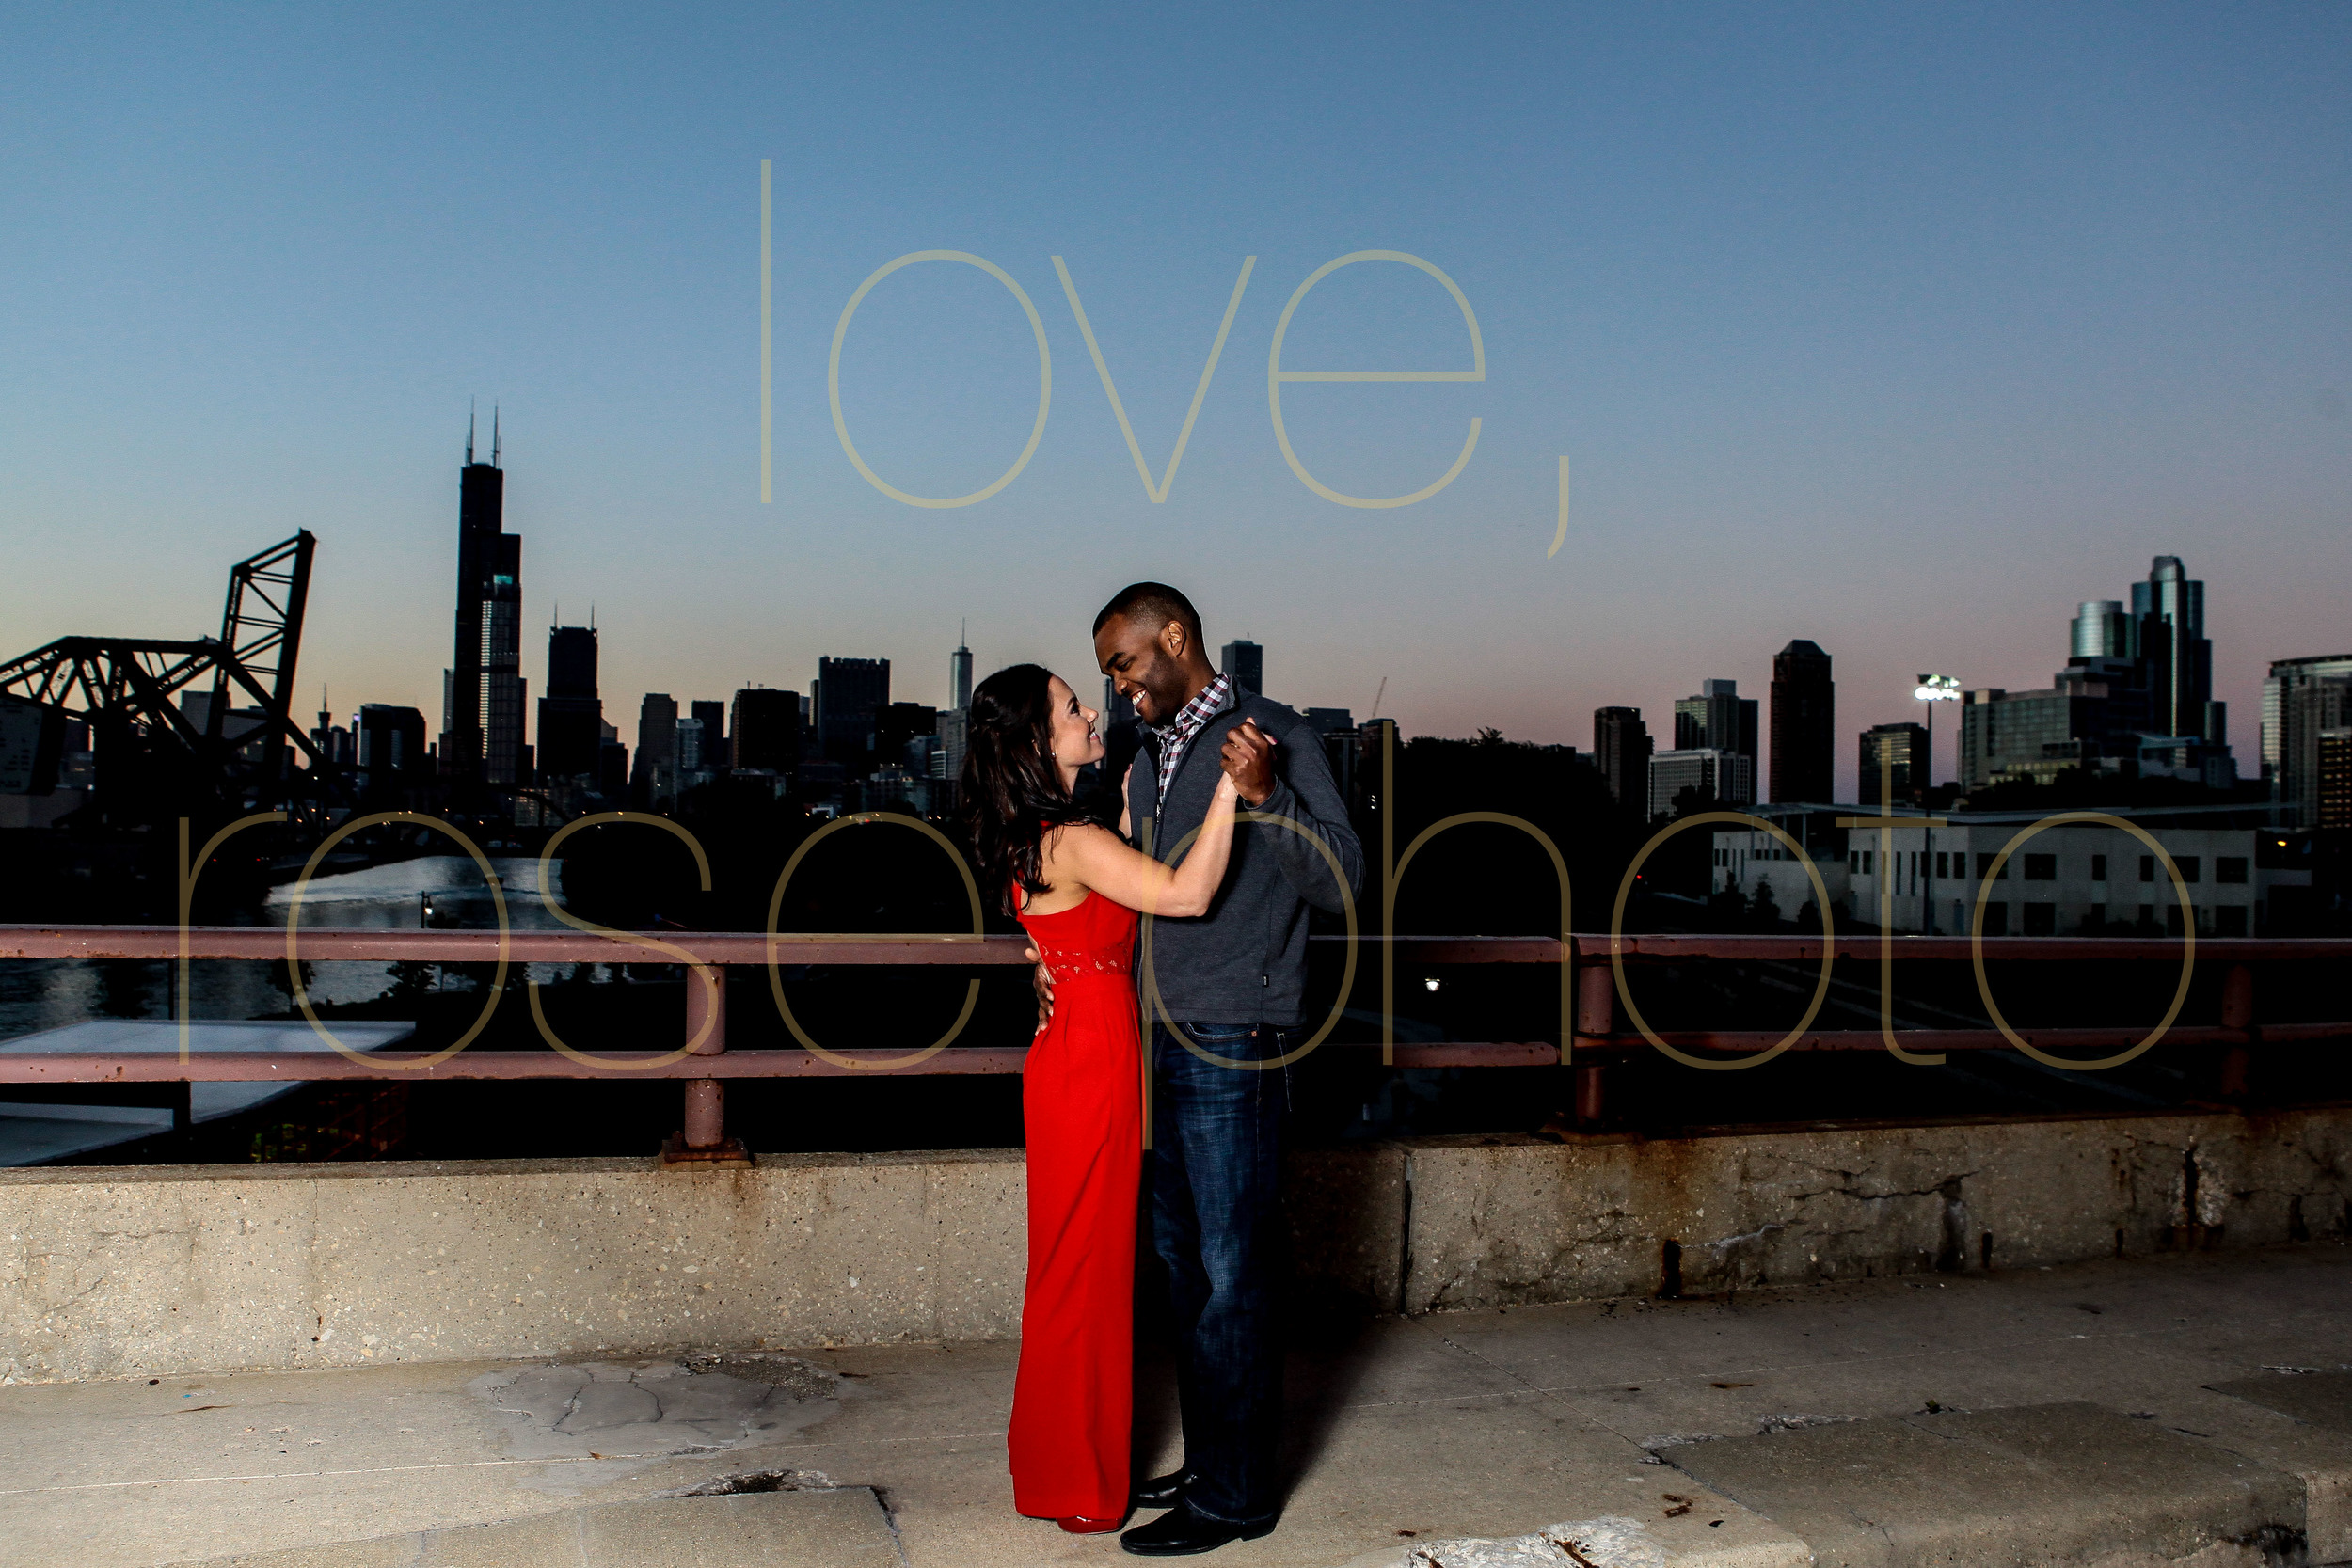 Sarah + Dimitri enagement shoot south loop 18th street bridge Chicago love has no boundries biracial couple loverosephoto -015.jpg